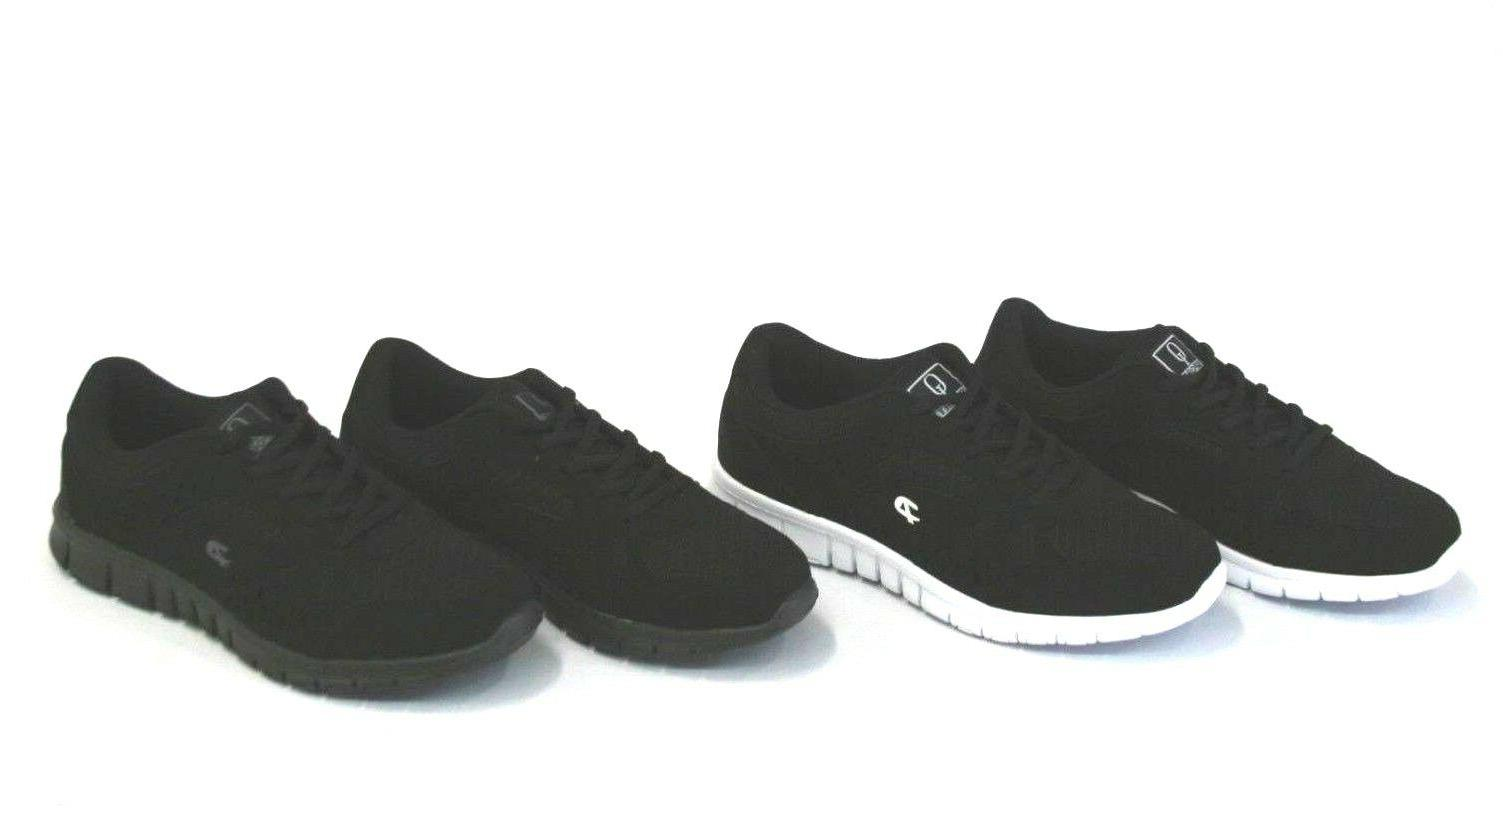 Mens Athletic Running Tennis Shoes Light Weight Walking Trai